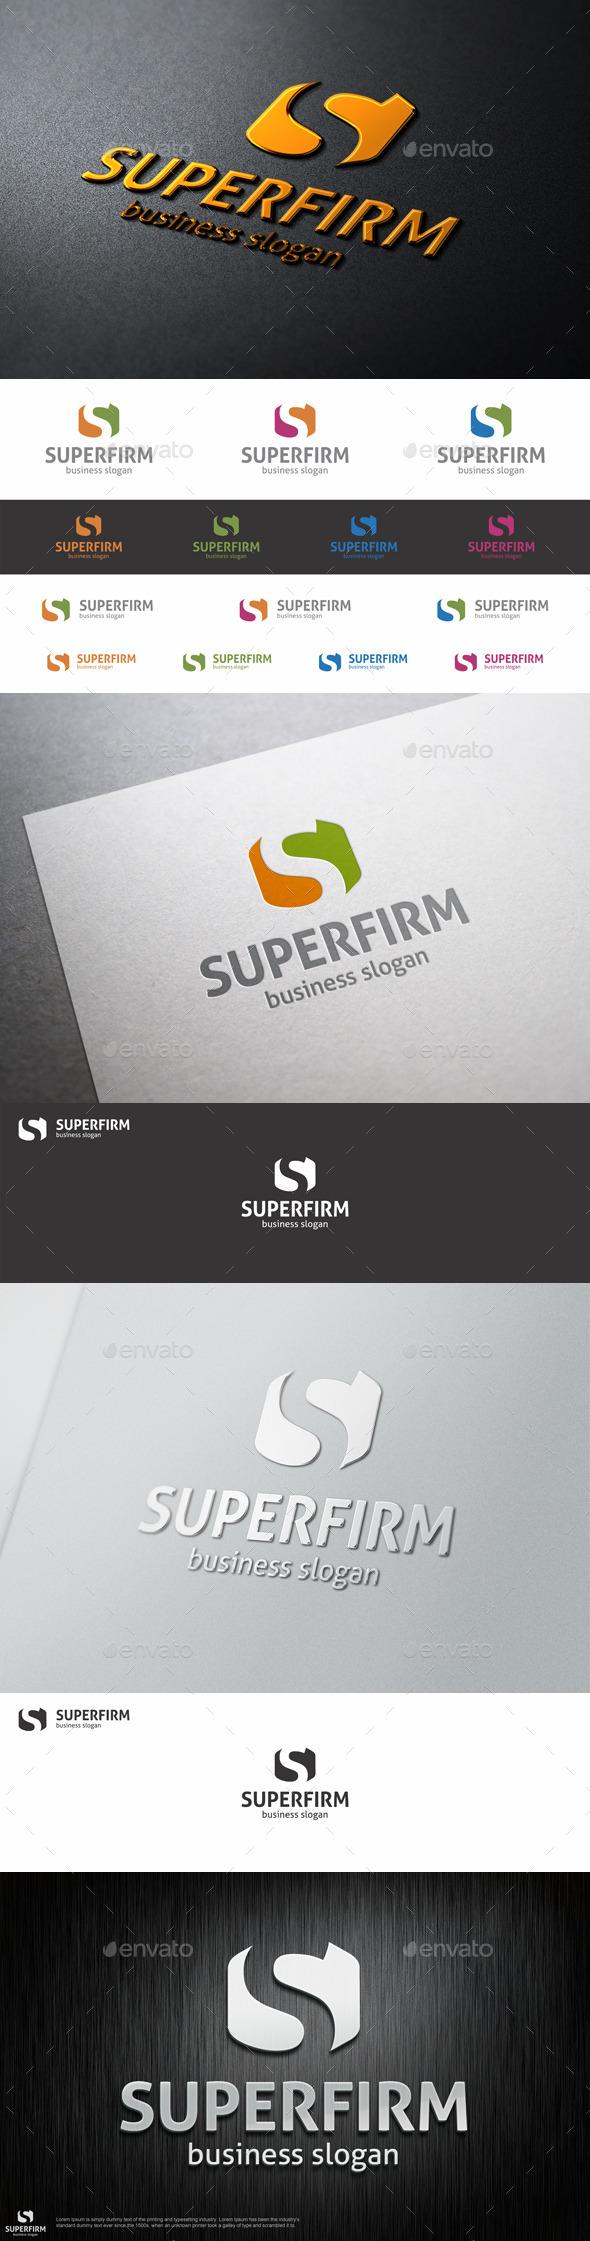 Super Firm - S Logo Letter